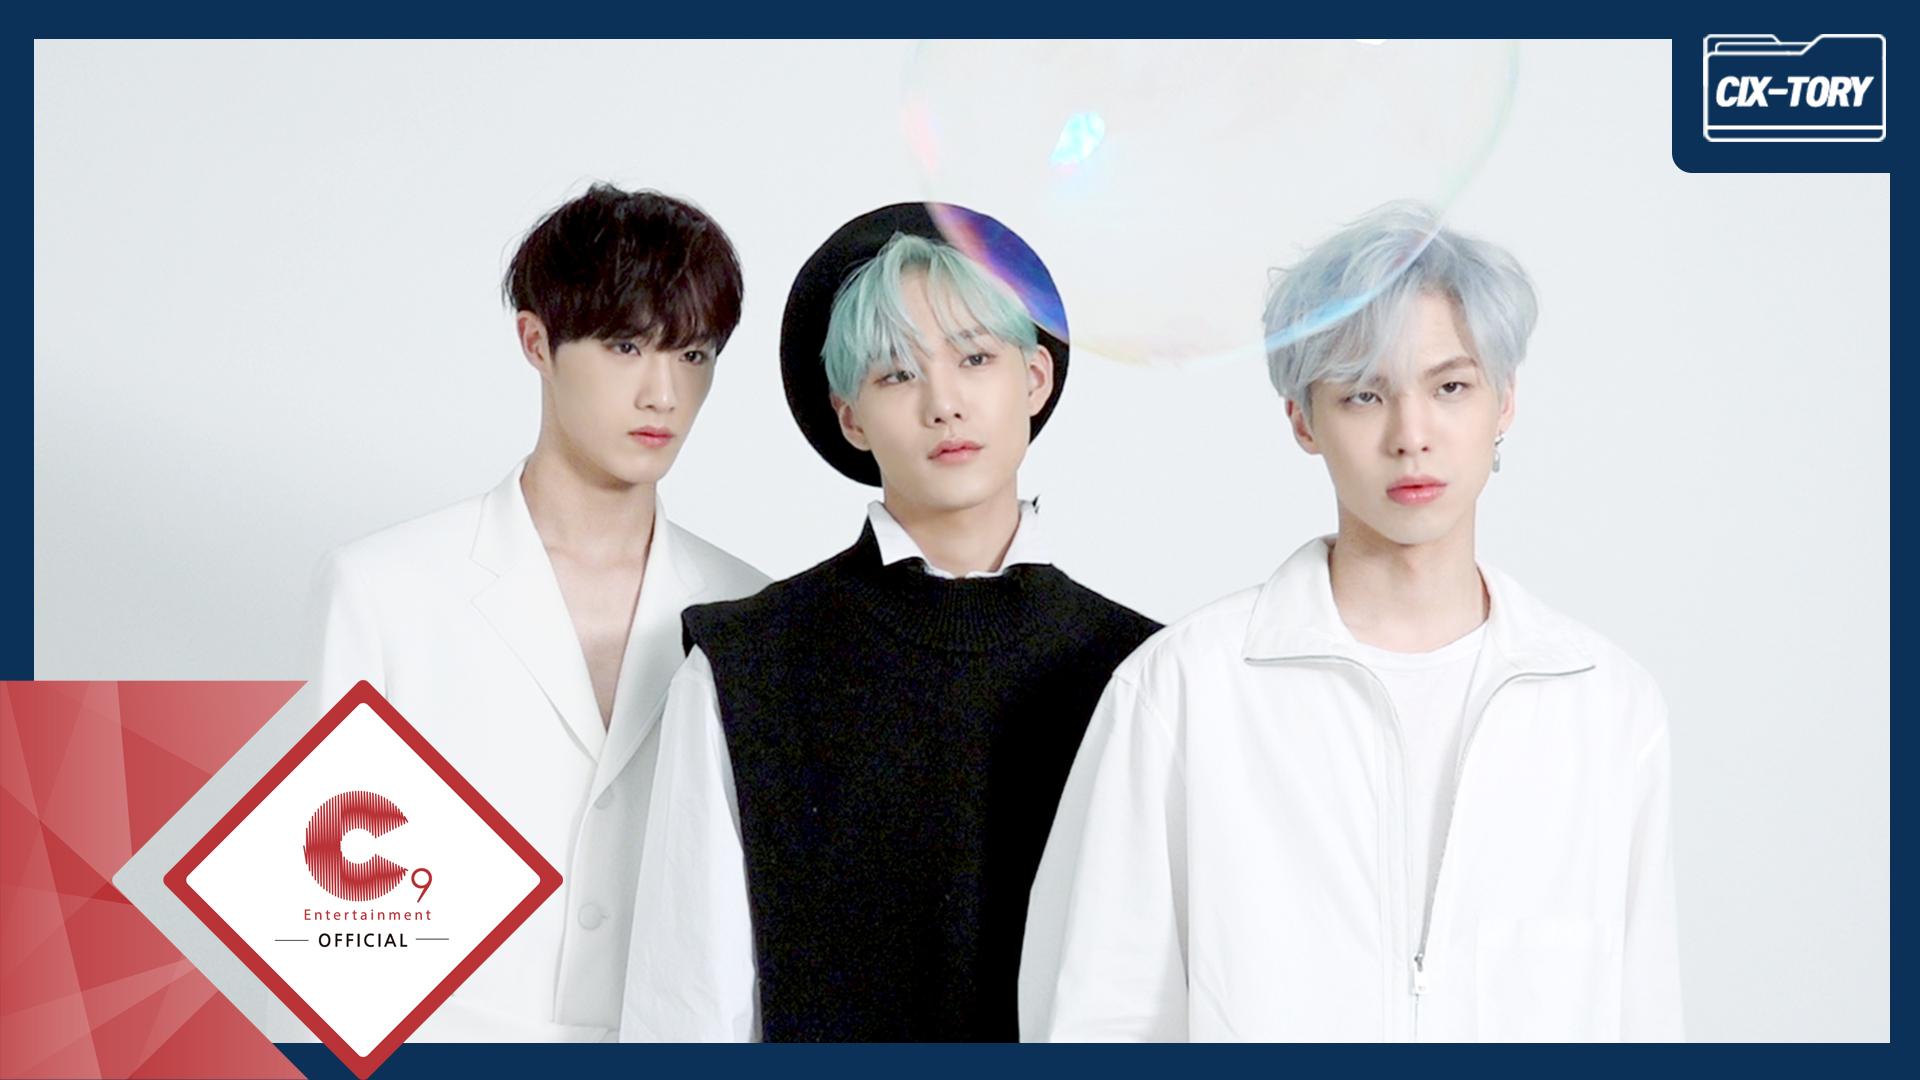 [CIX-tory] STORY.23 더스타(THE STAR) 12월호 화보 촬영 현장